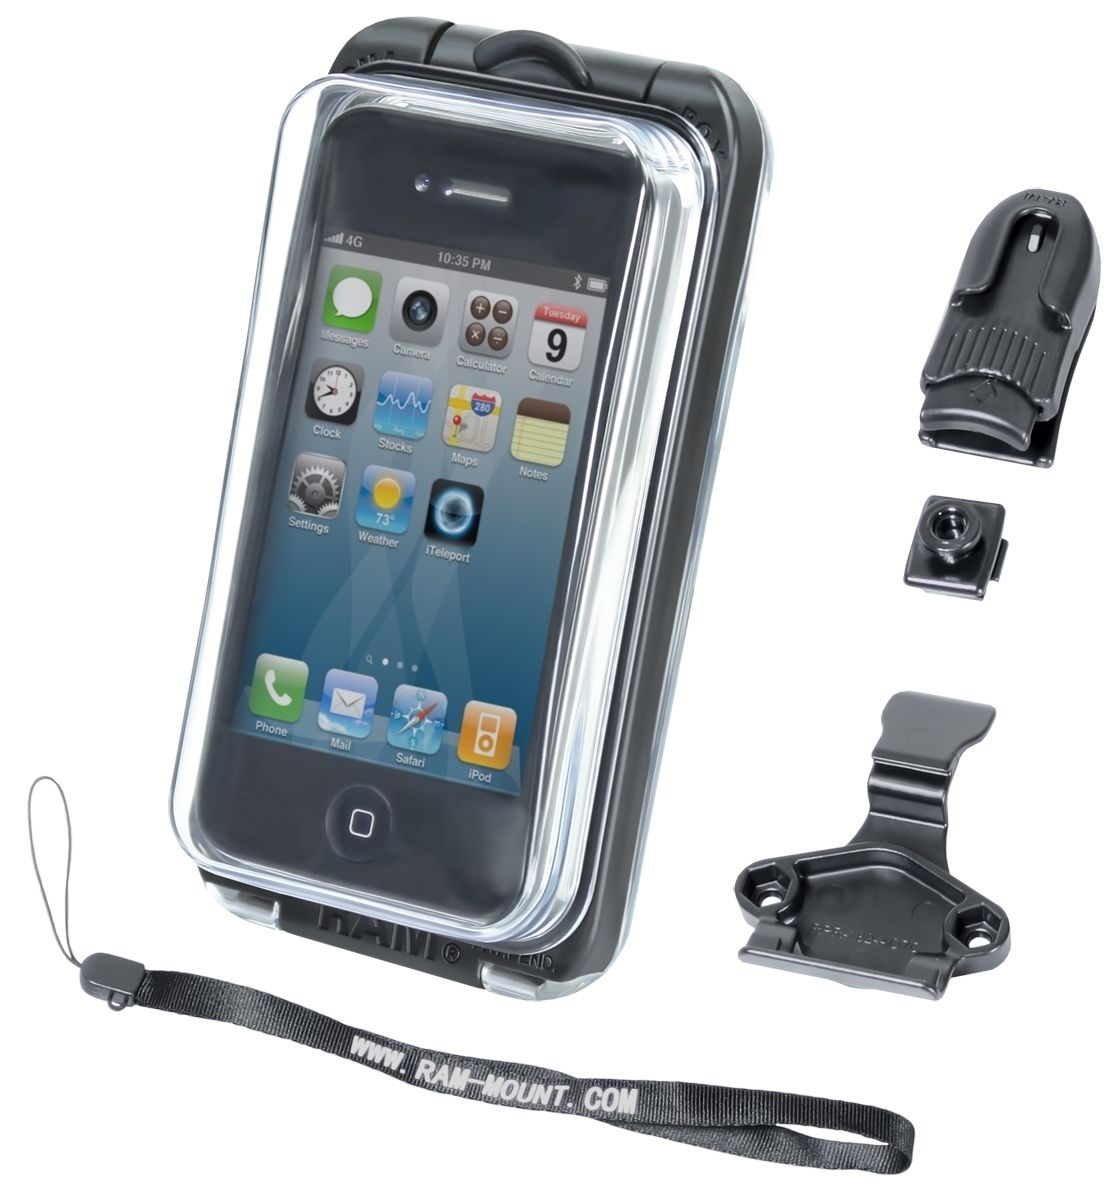 RAM Mounts Aqua Box PRO 10 - mit Gürtel-Clip, Befestigungs-Clip u. Handschlaufe